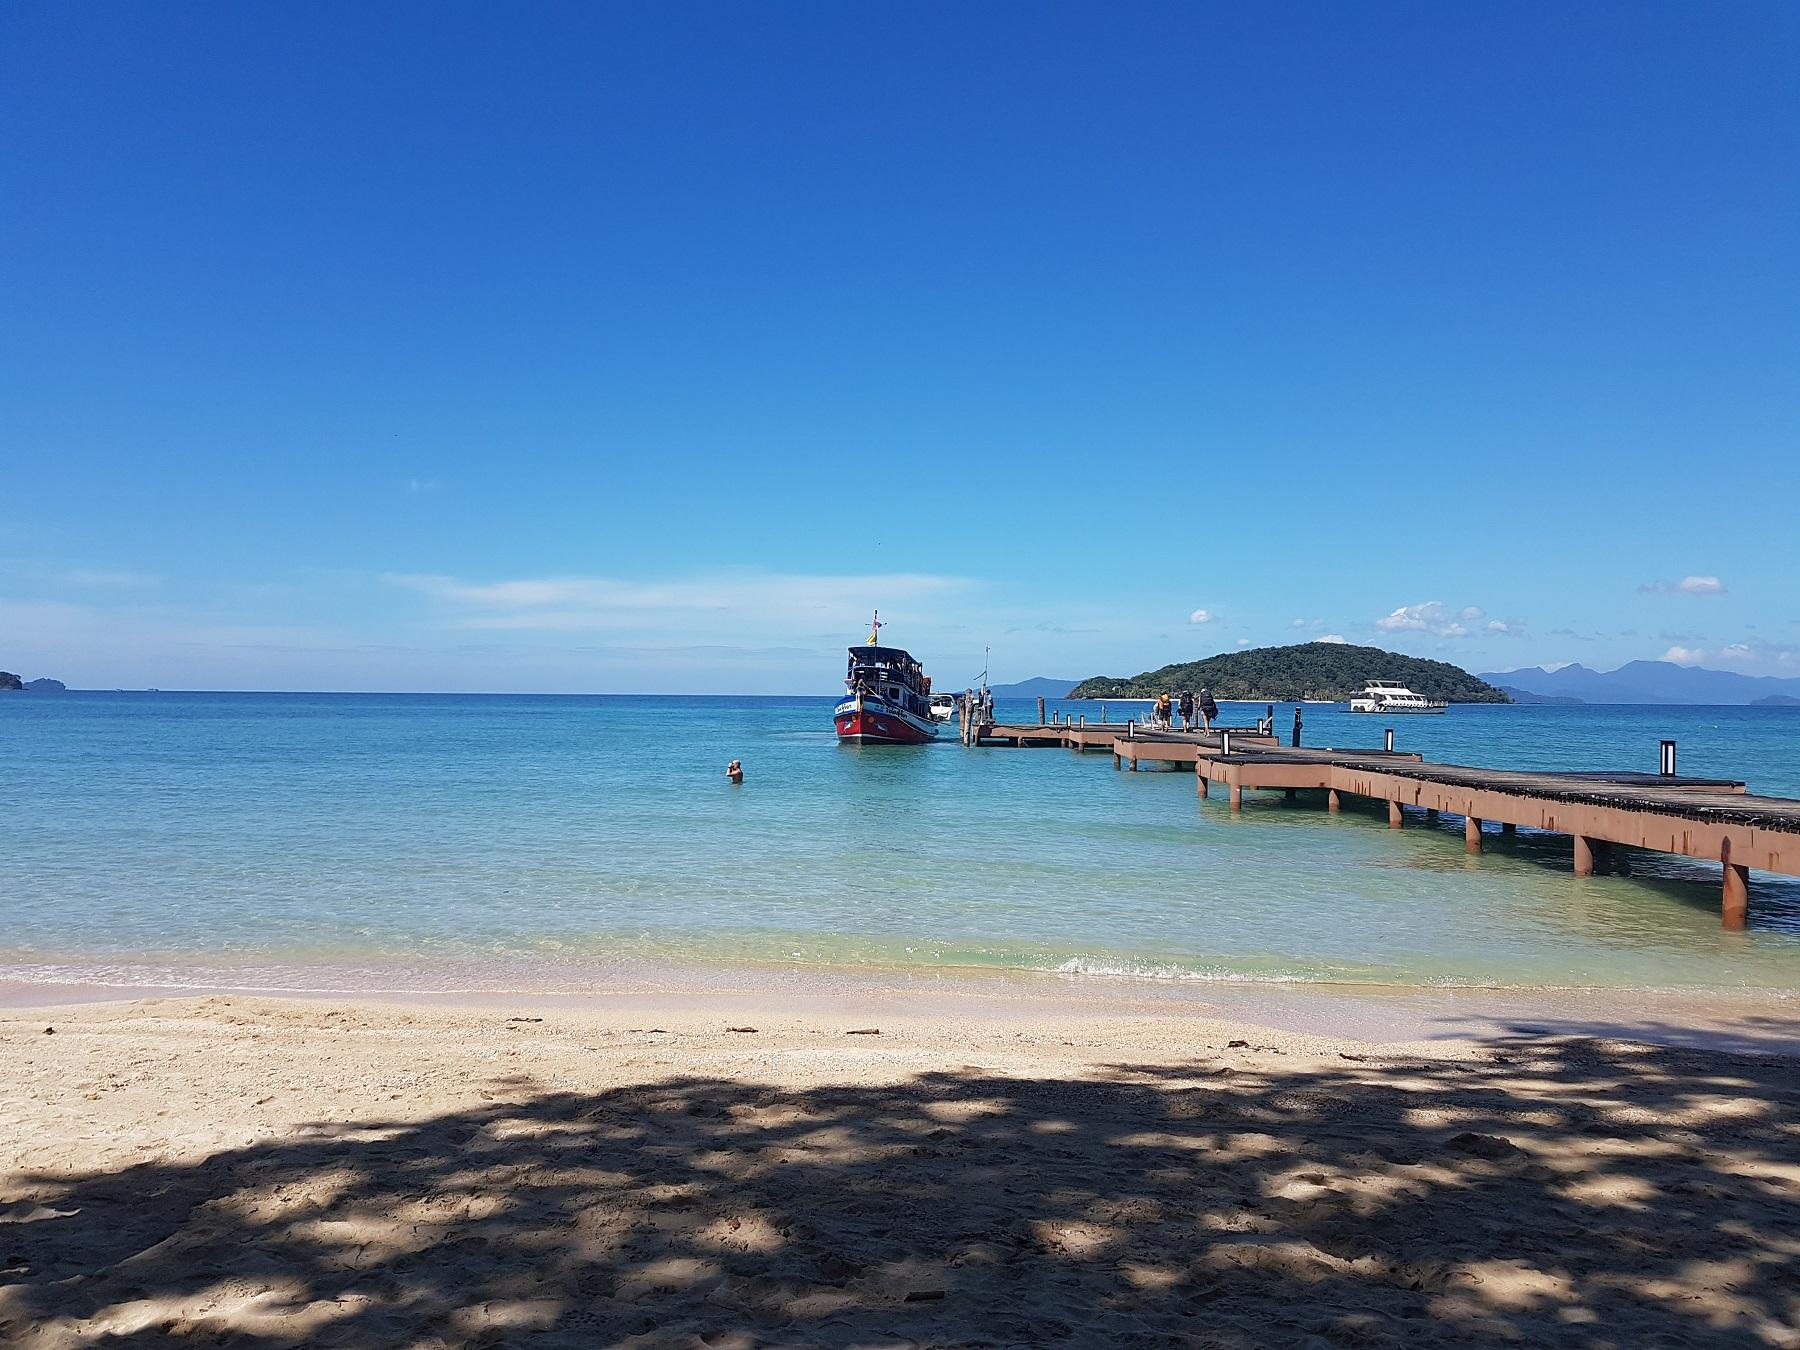 koh-mak-resort-pier